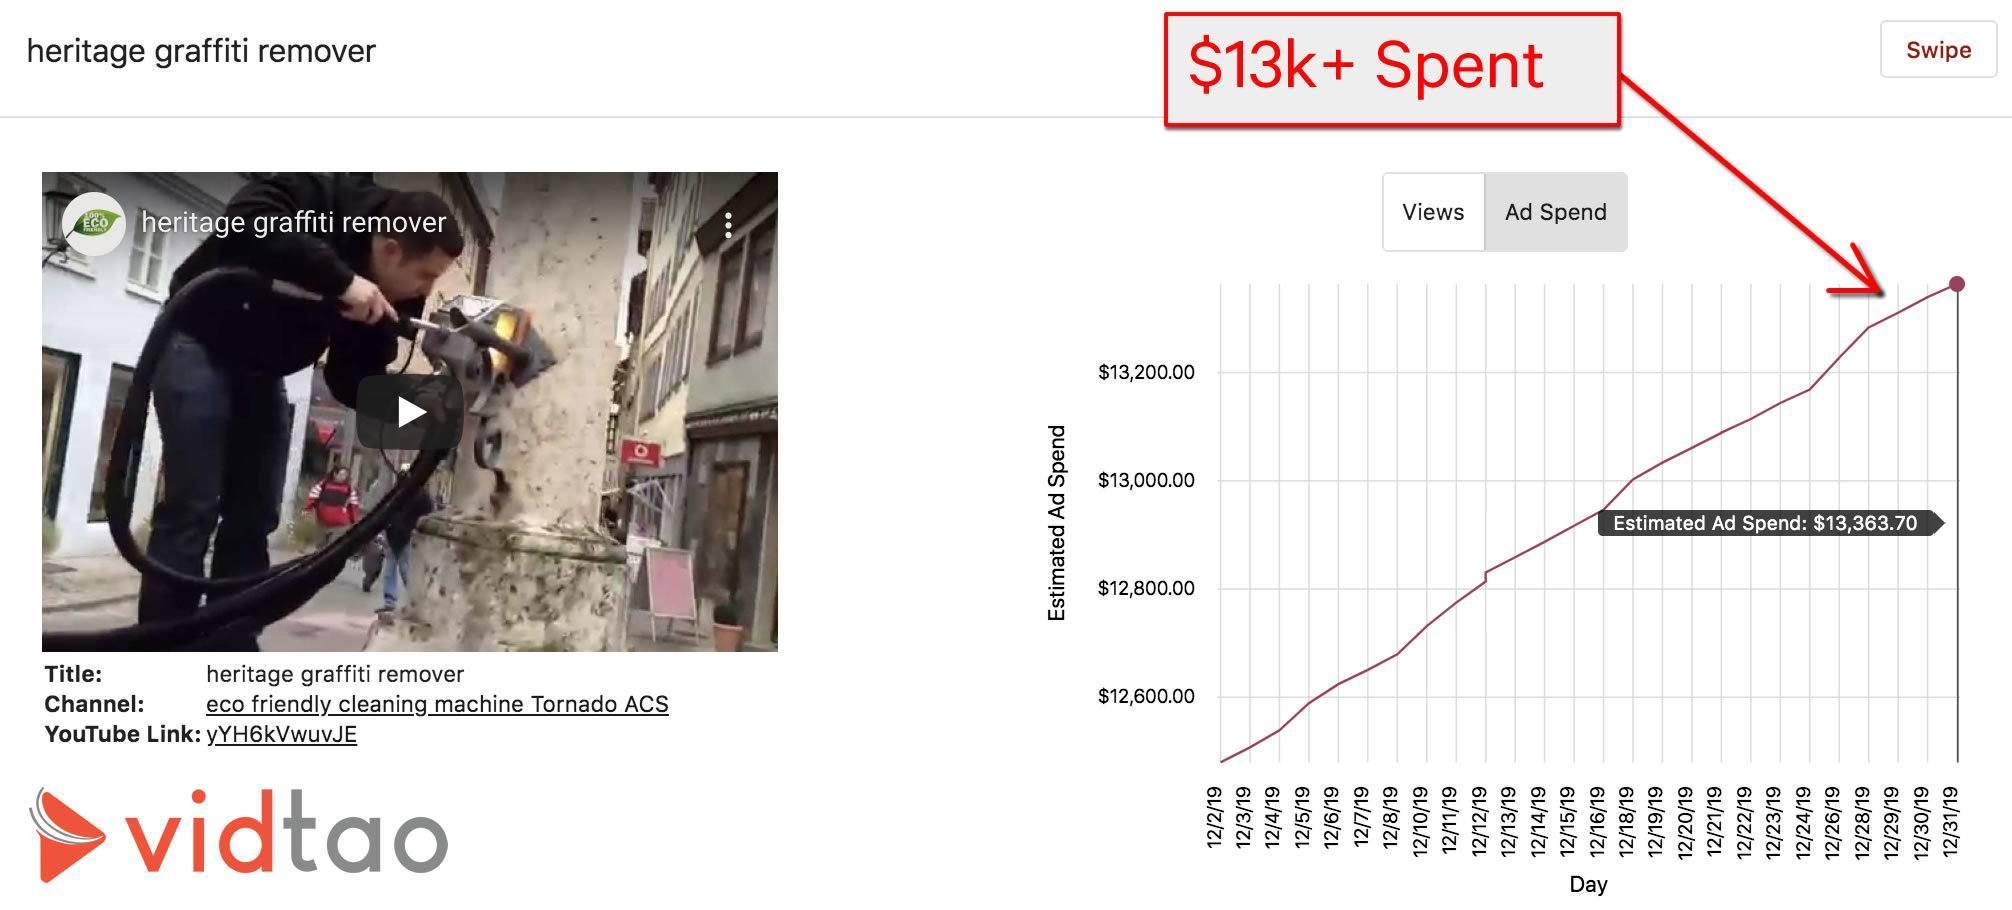 youtube ad spy tool graffiti removal video ad